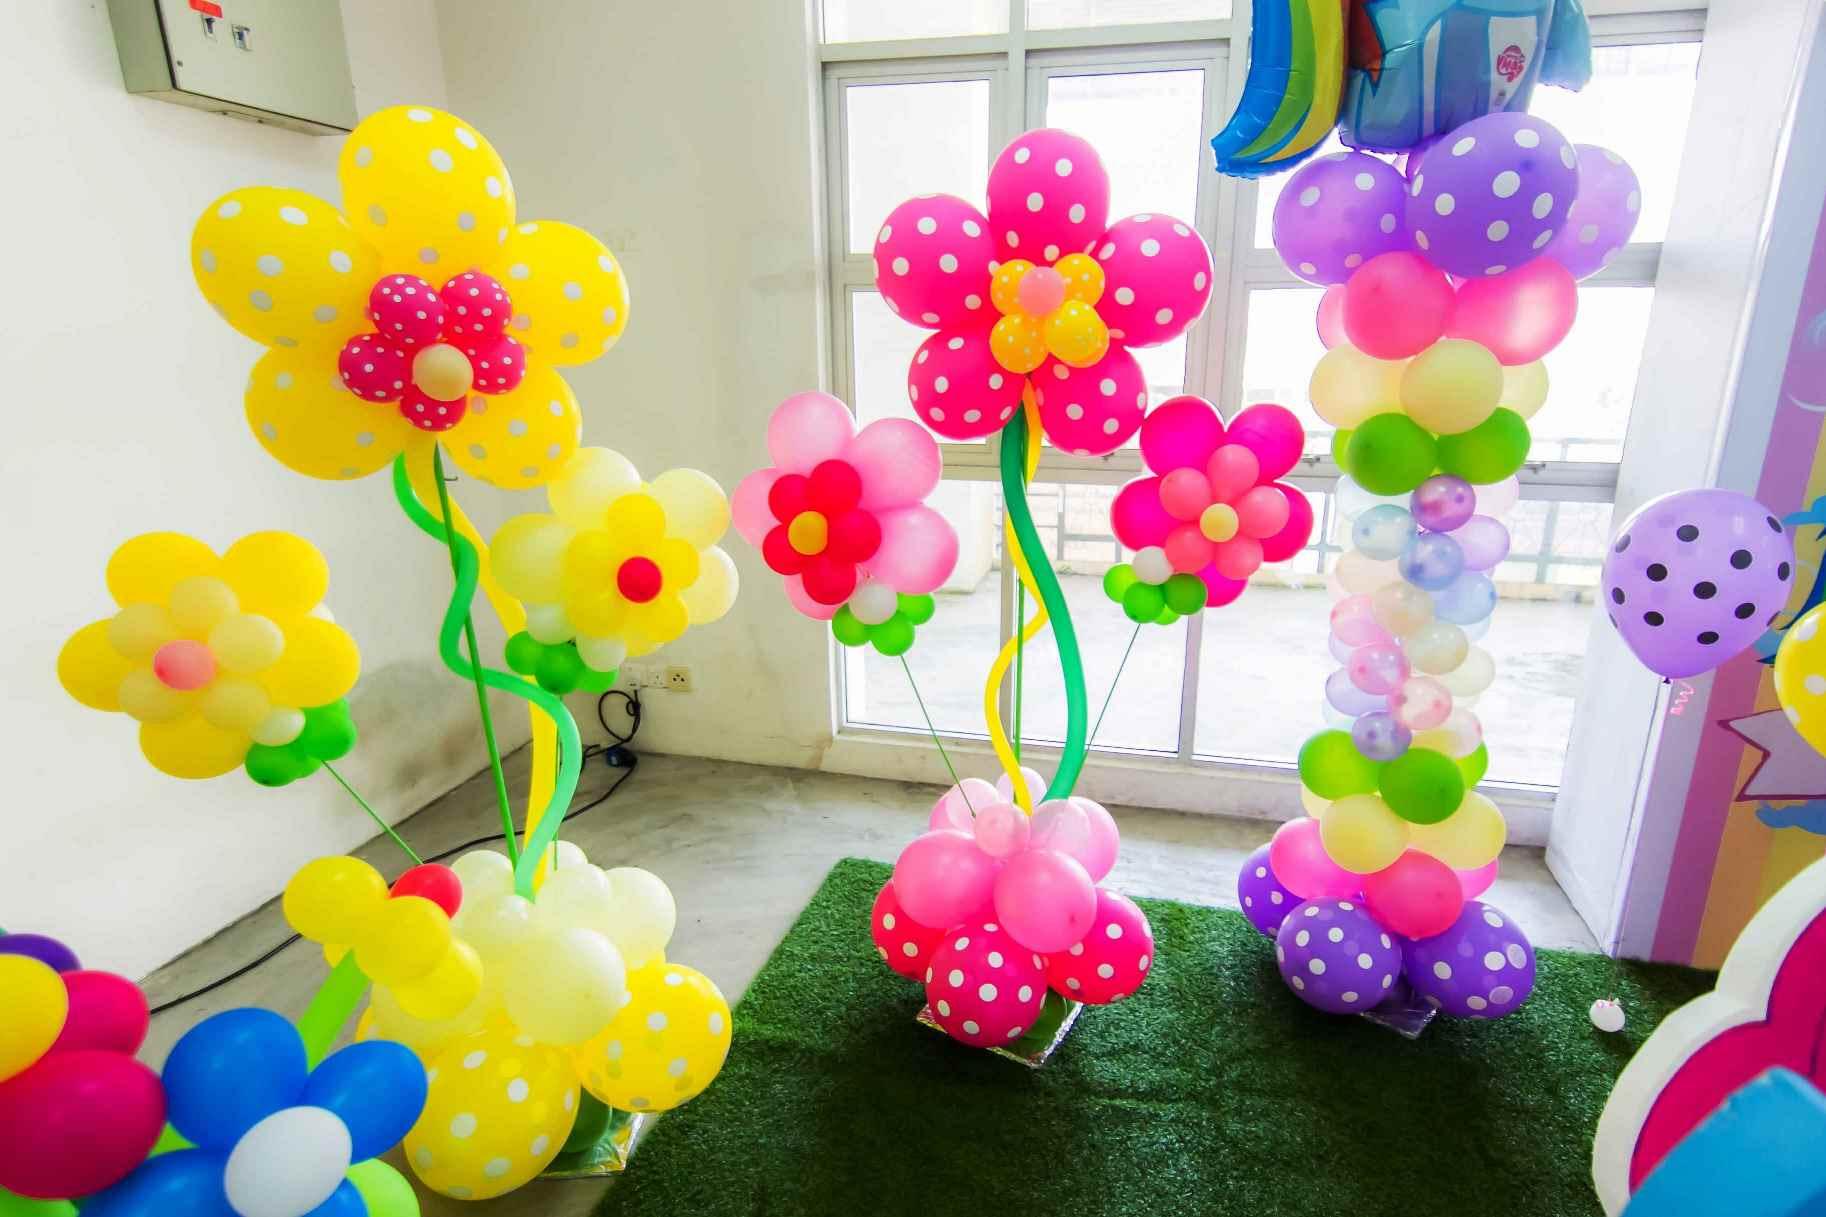 dekorasi balon ulang tahun anak tema my little pony